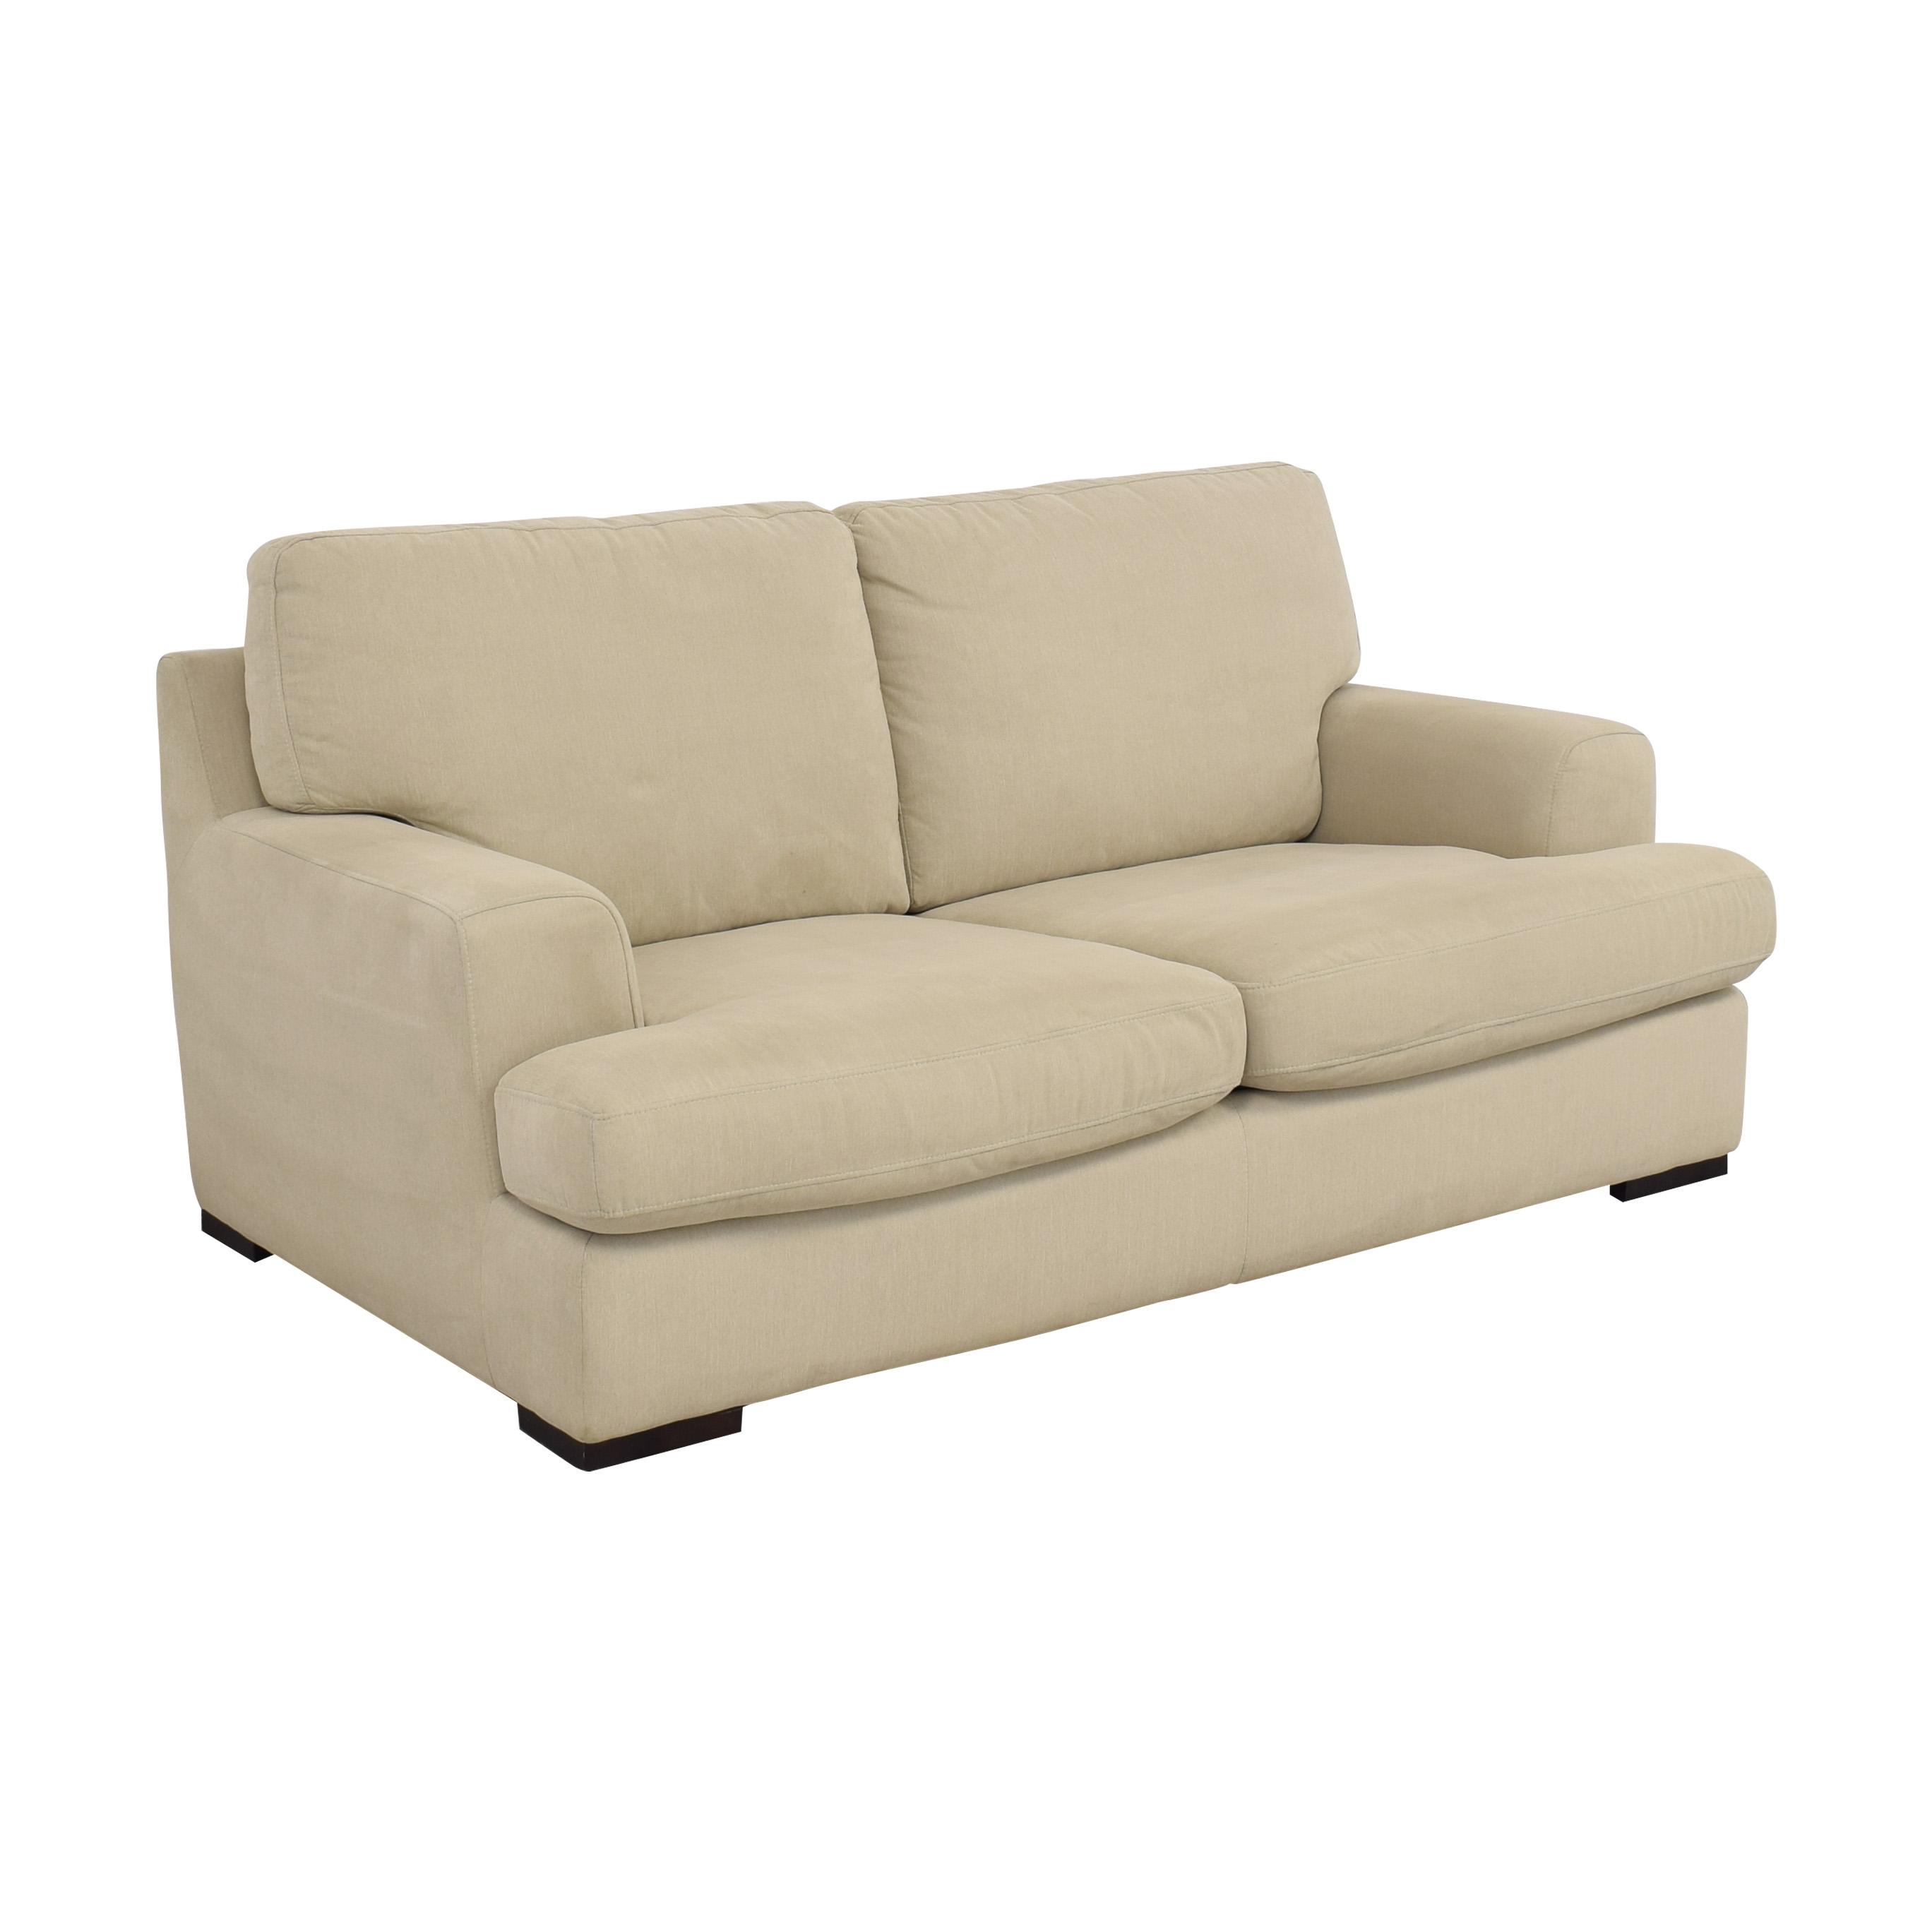 Stone & Beam Stone & Beam Lauren Down-Filled Oversized Sofa discount